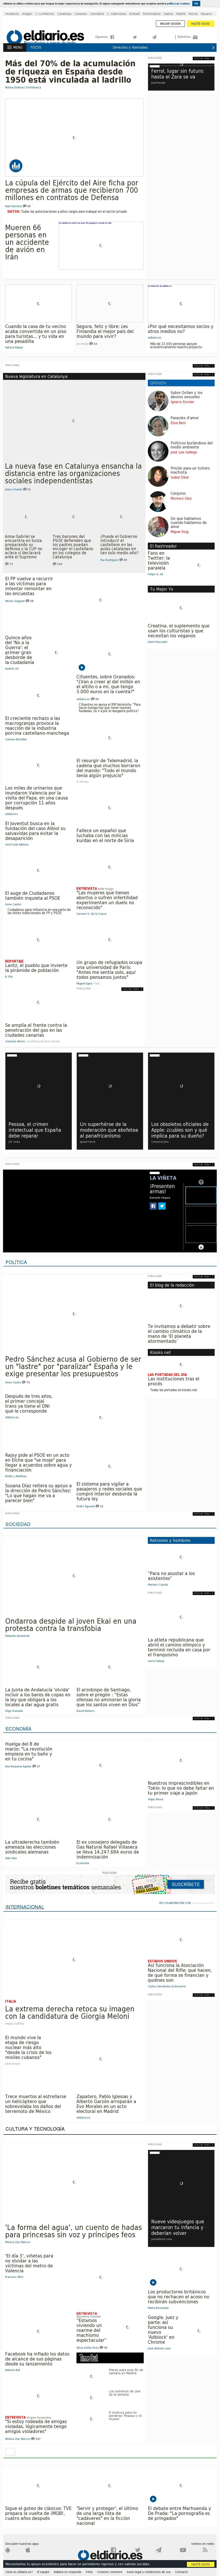 El Diario at Thursday March 15, 2018, 8:02 a.m. UTC